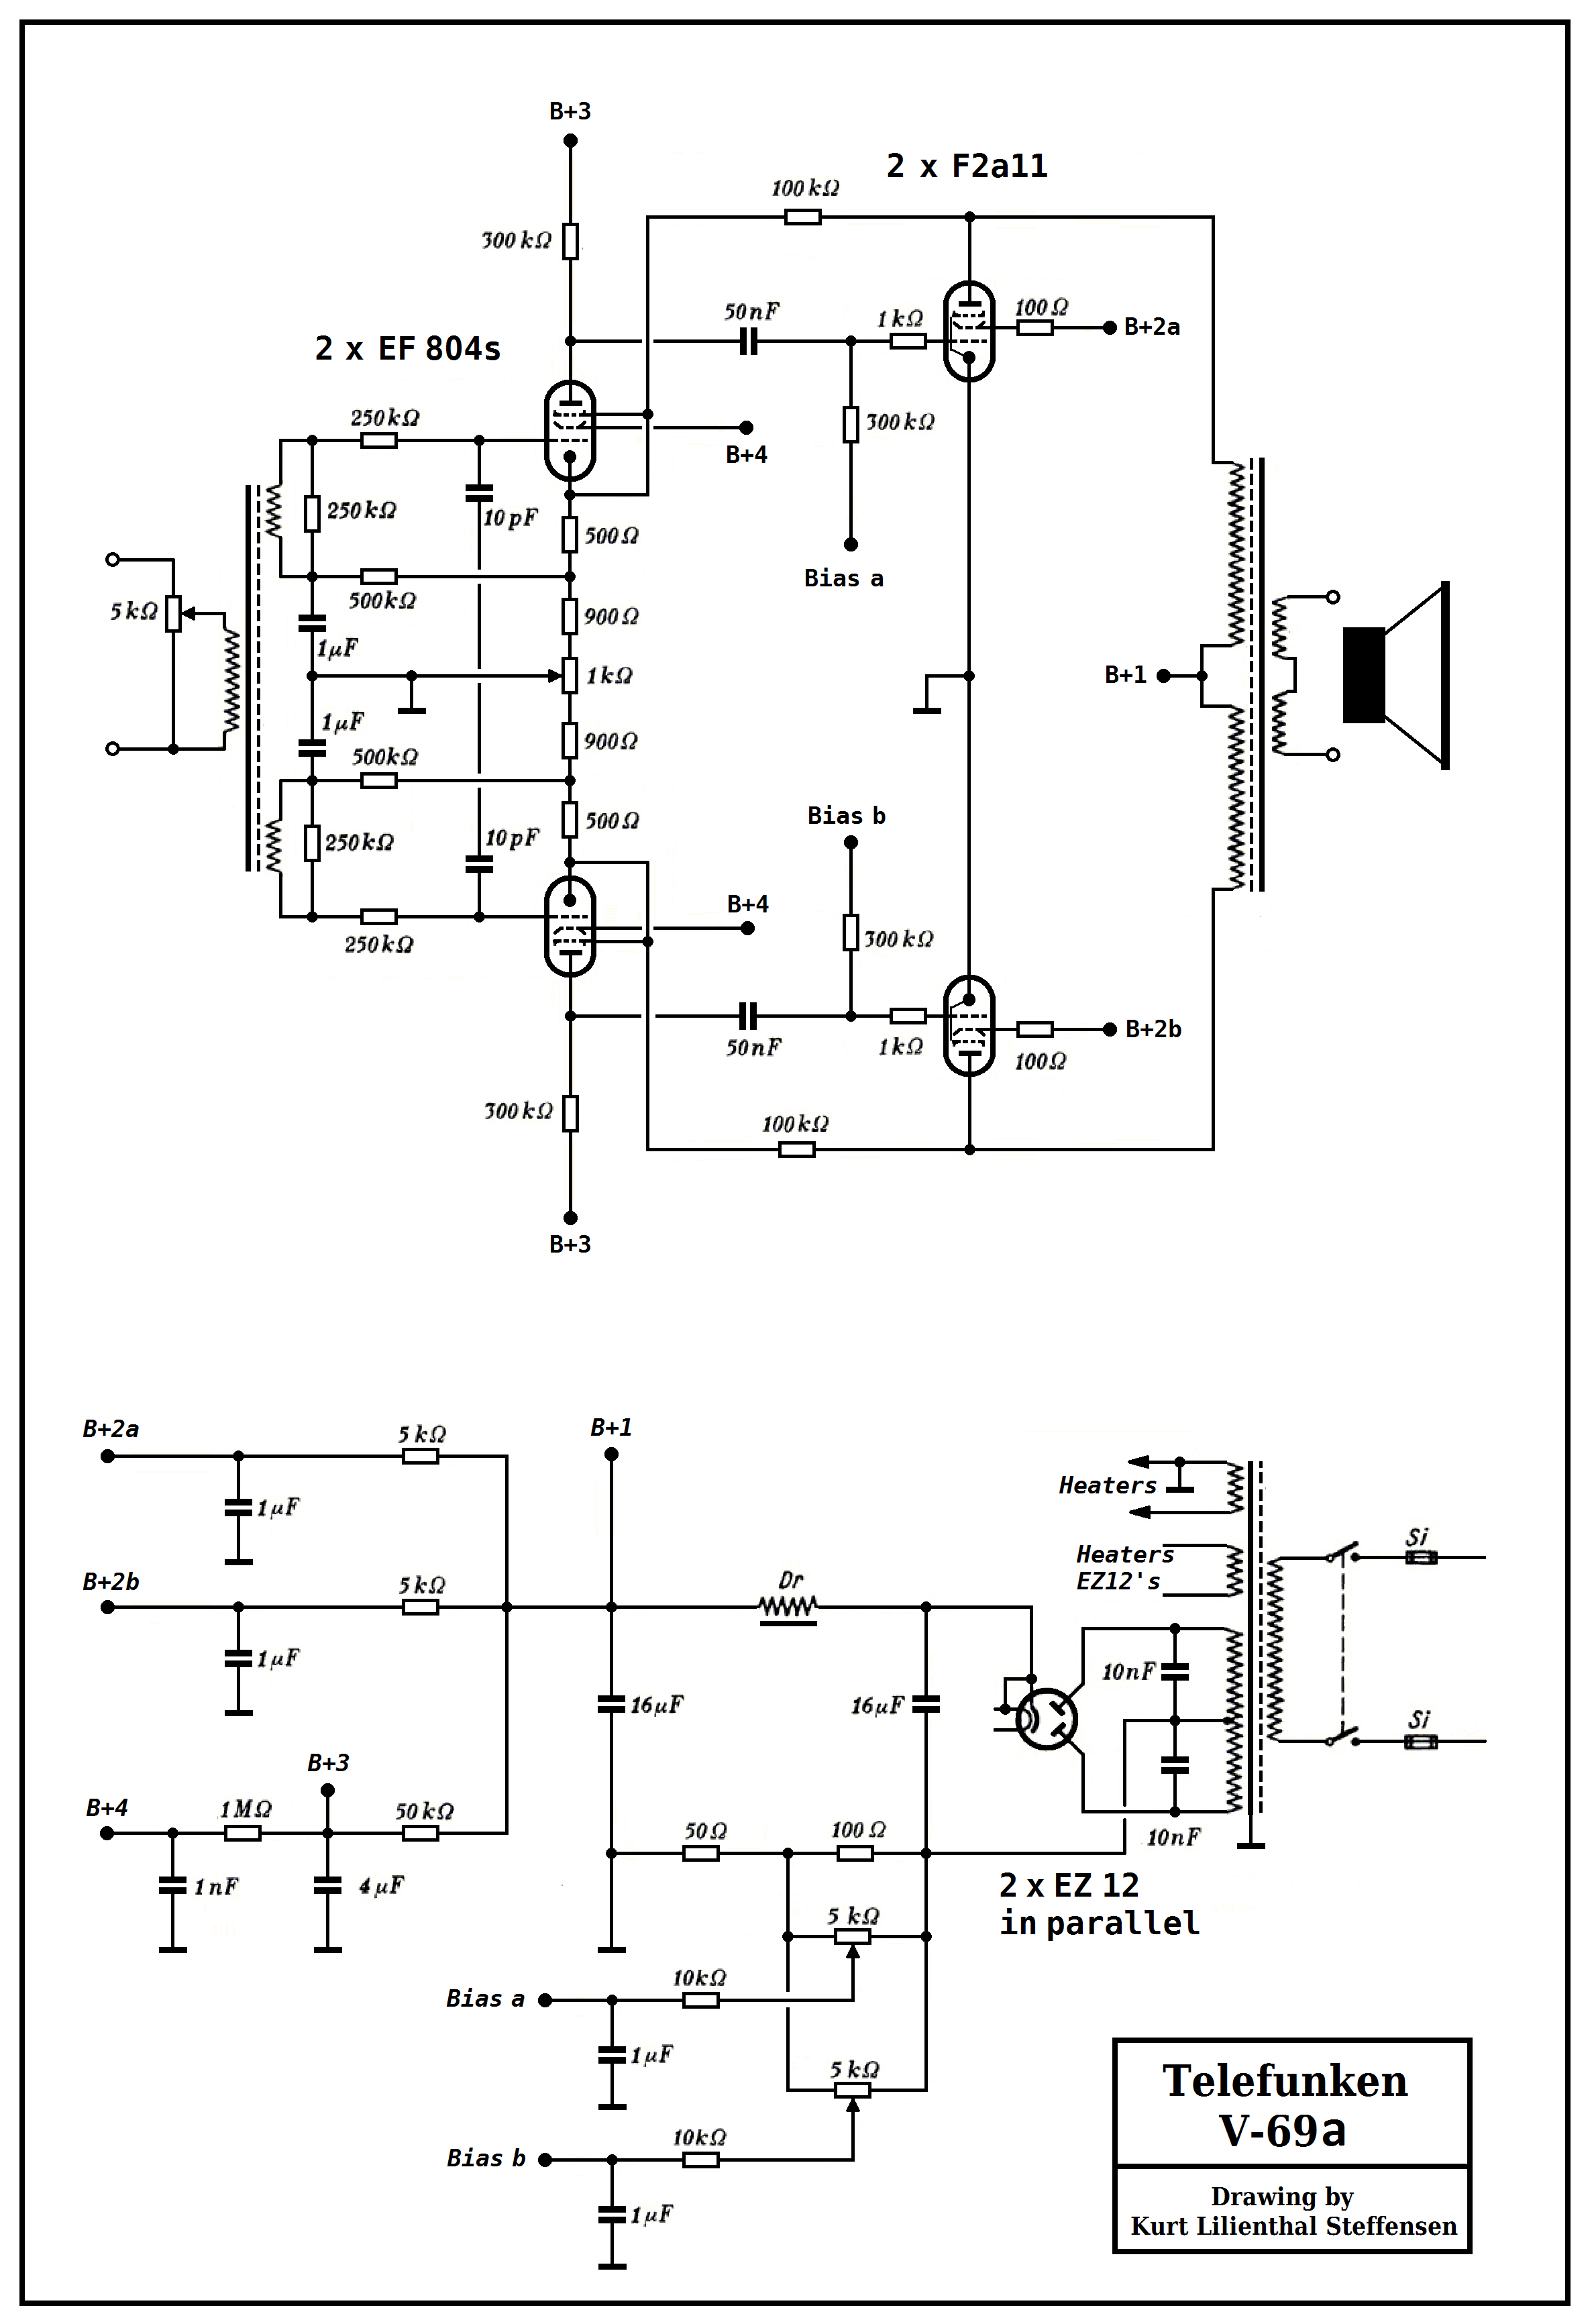 Telefunken, V69a, ed, vers 3